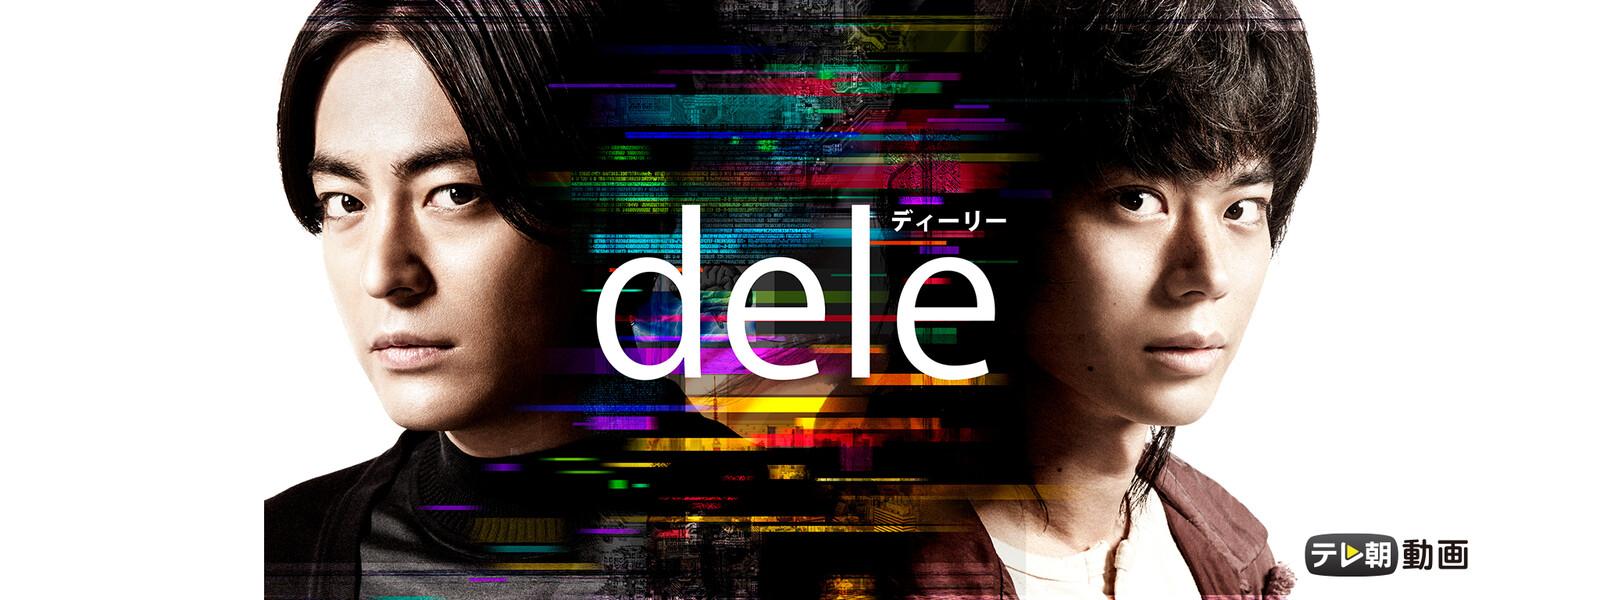 dele(ディーリー) 動画